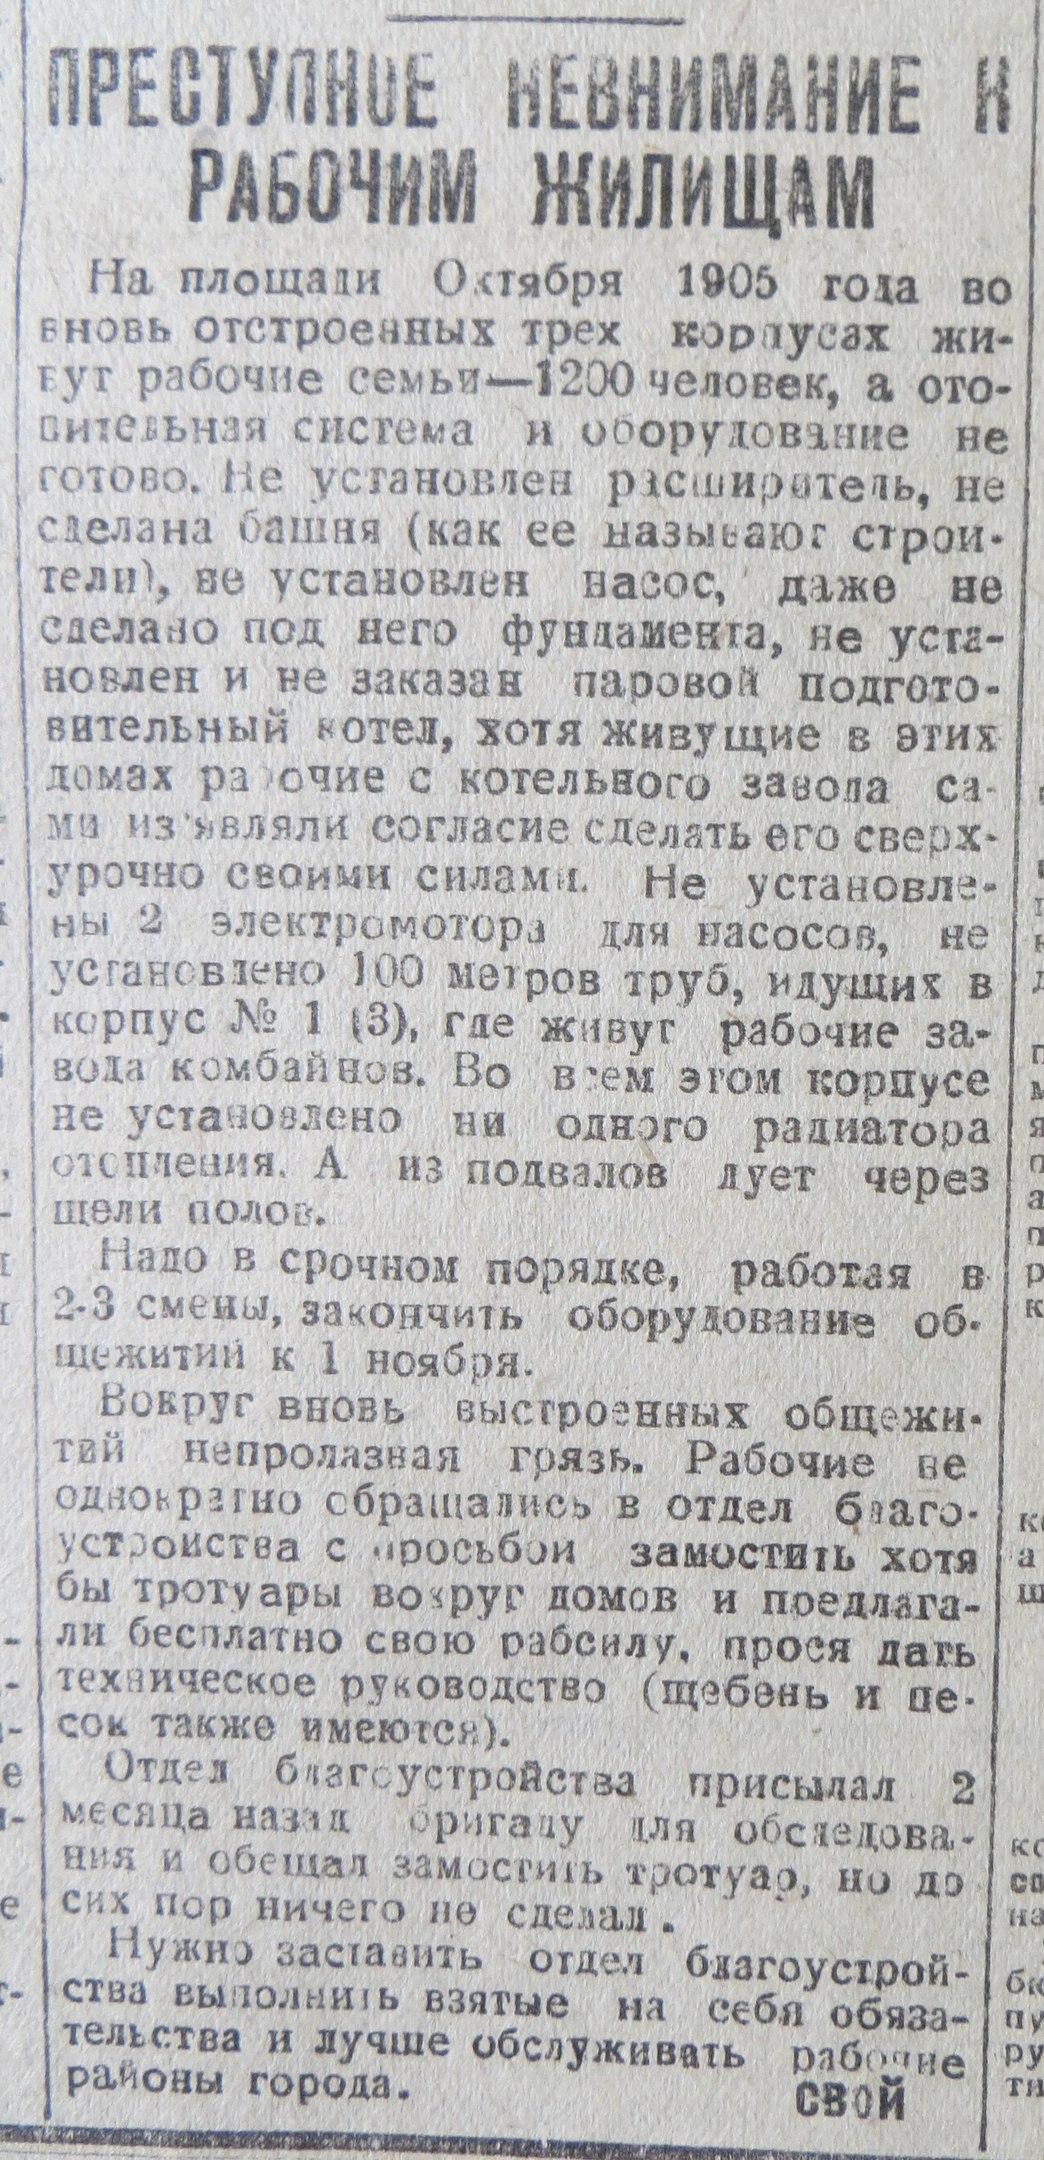 1931-10-22 дома 8 марта недоделки.jpg